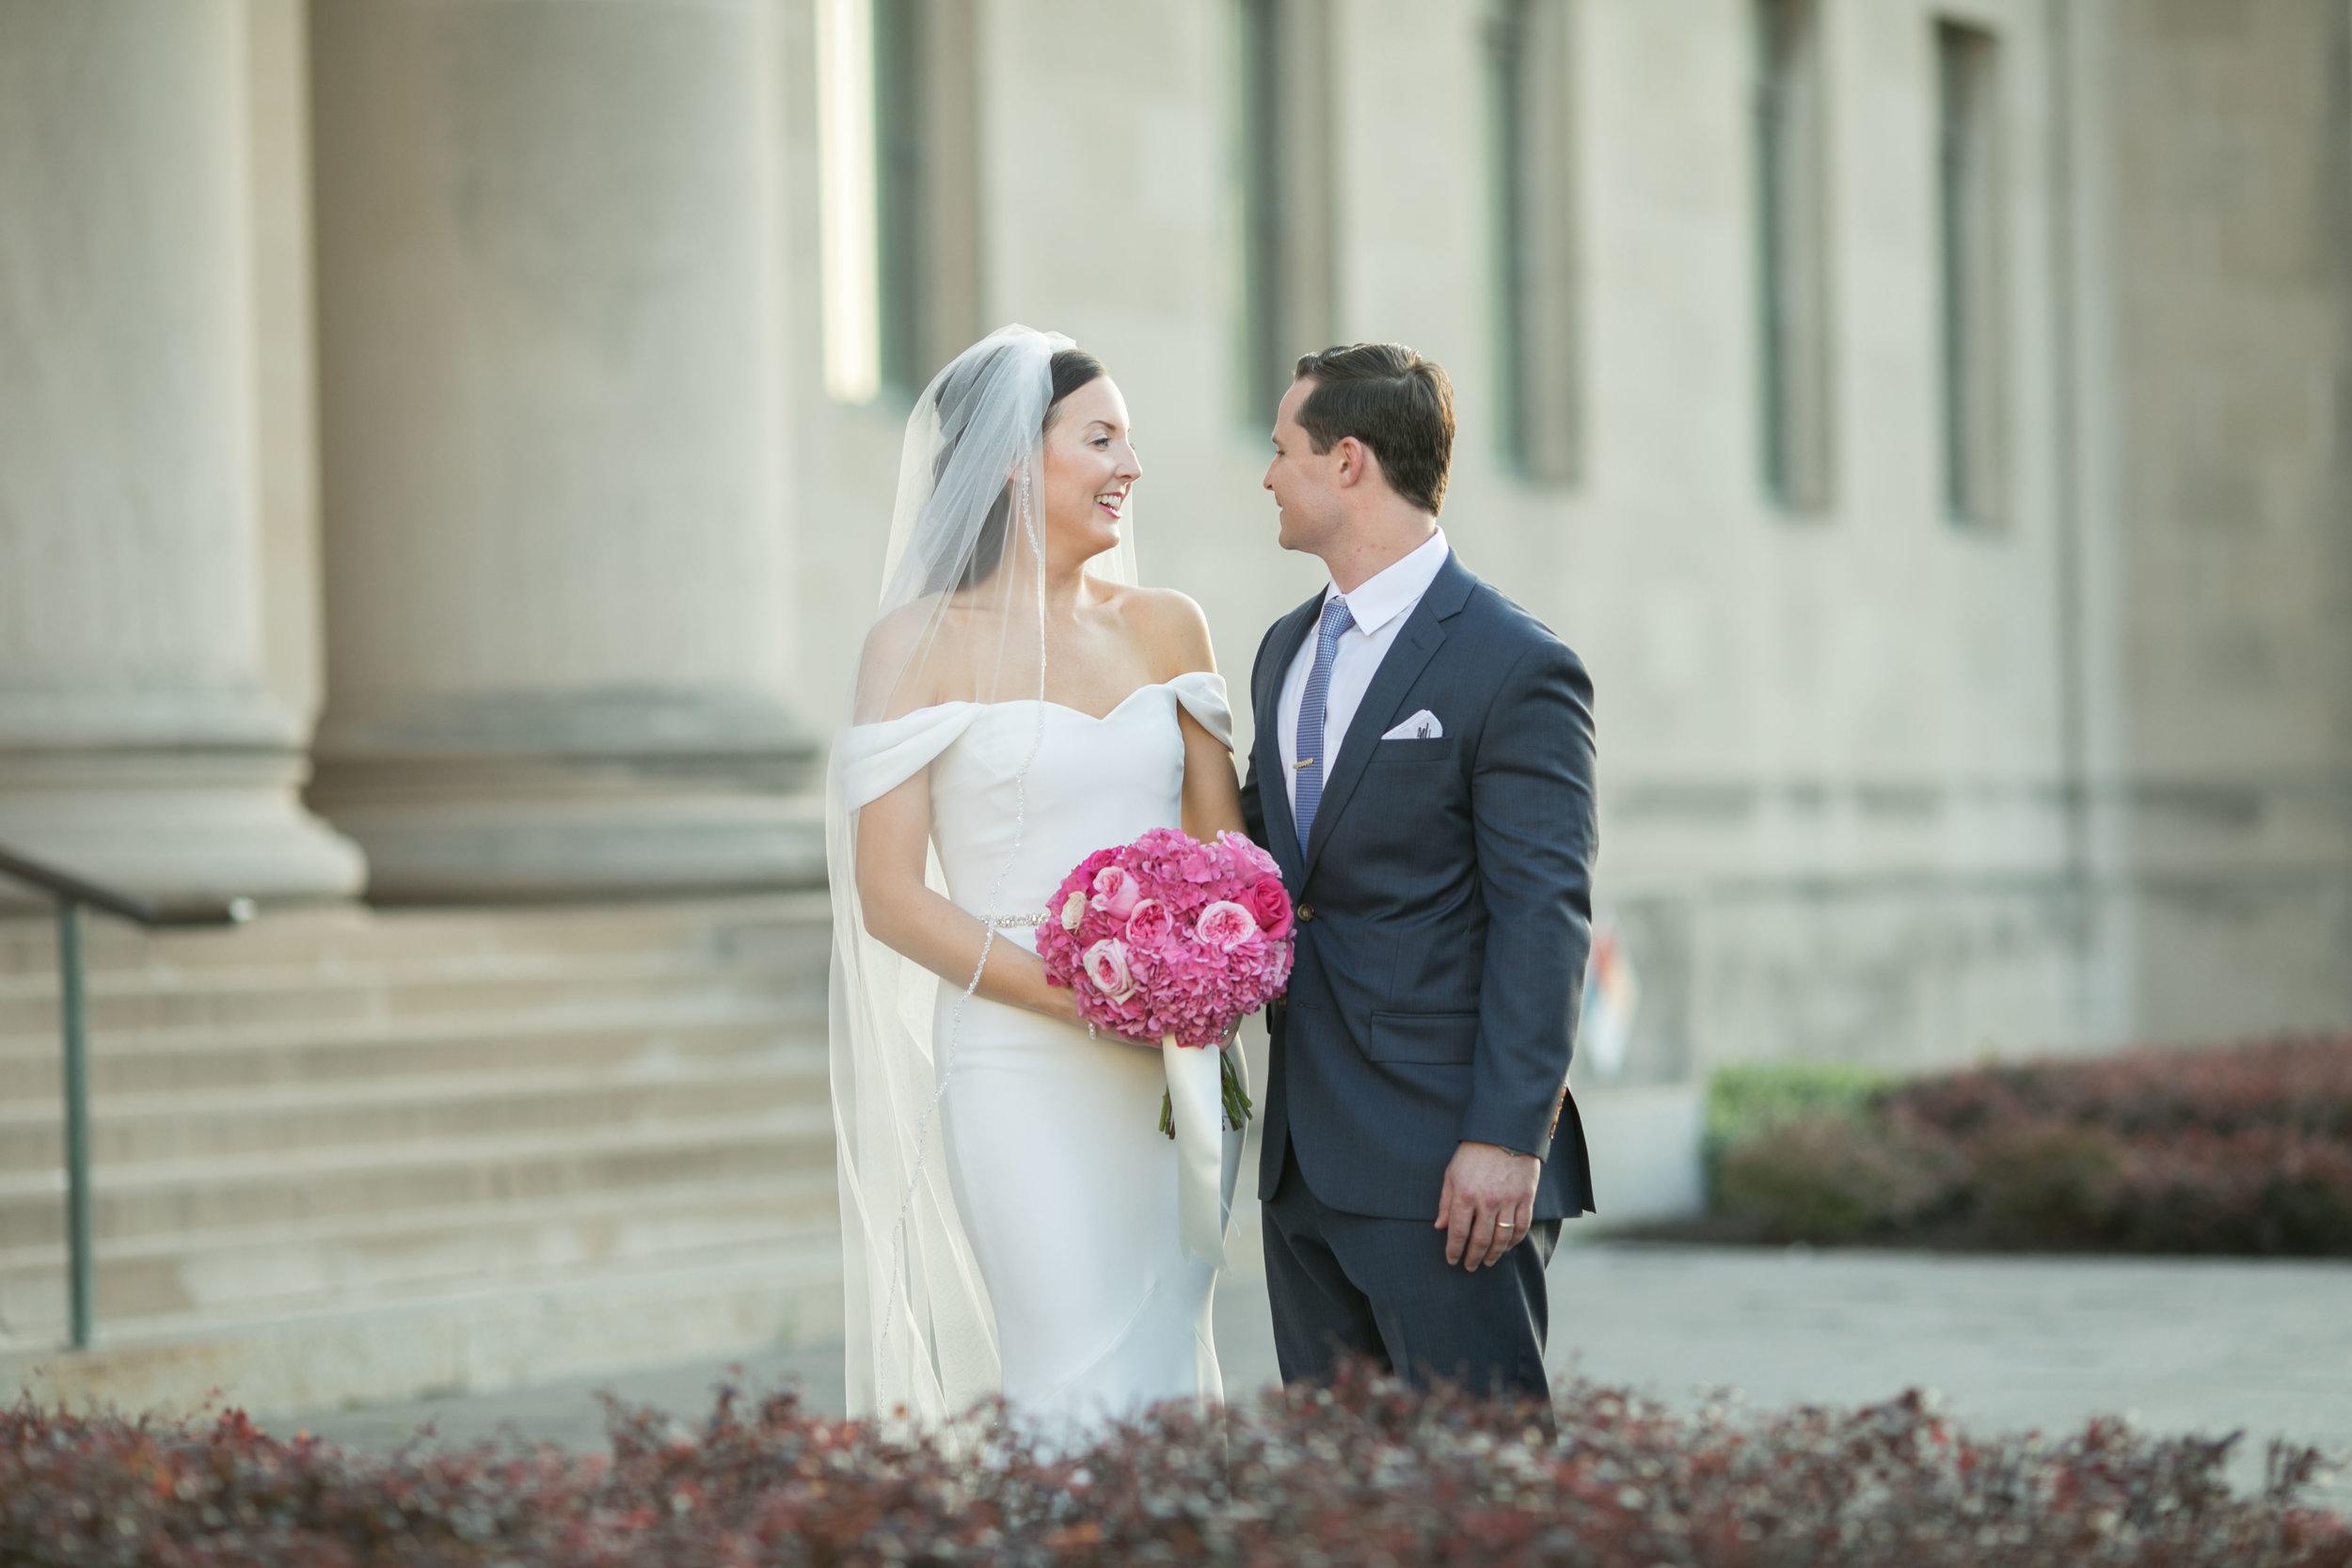 nelson-atkins-wedding-62.jpg